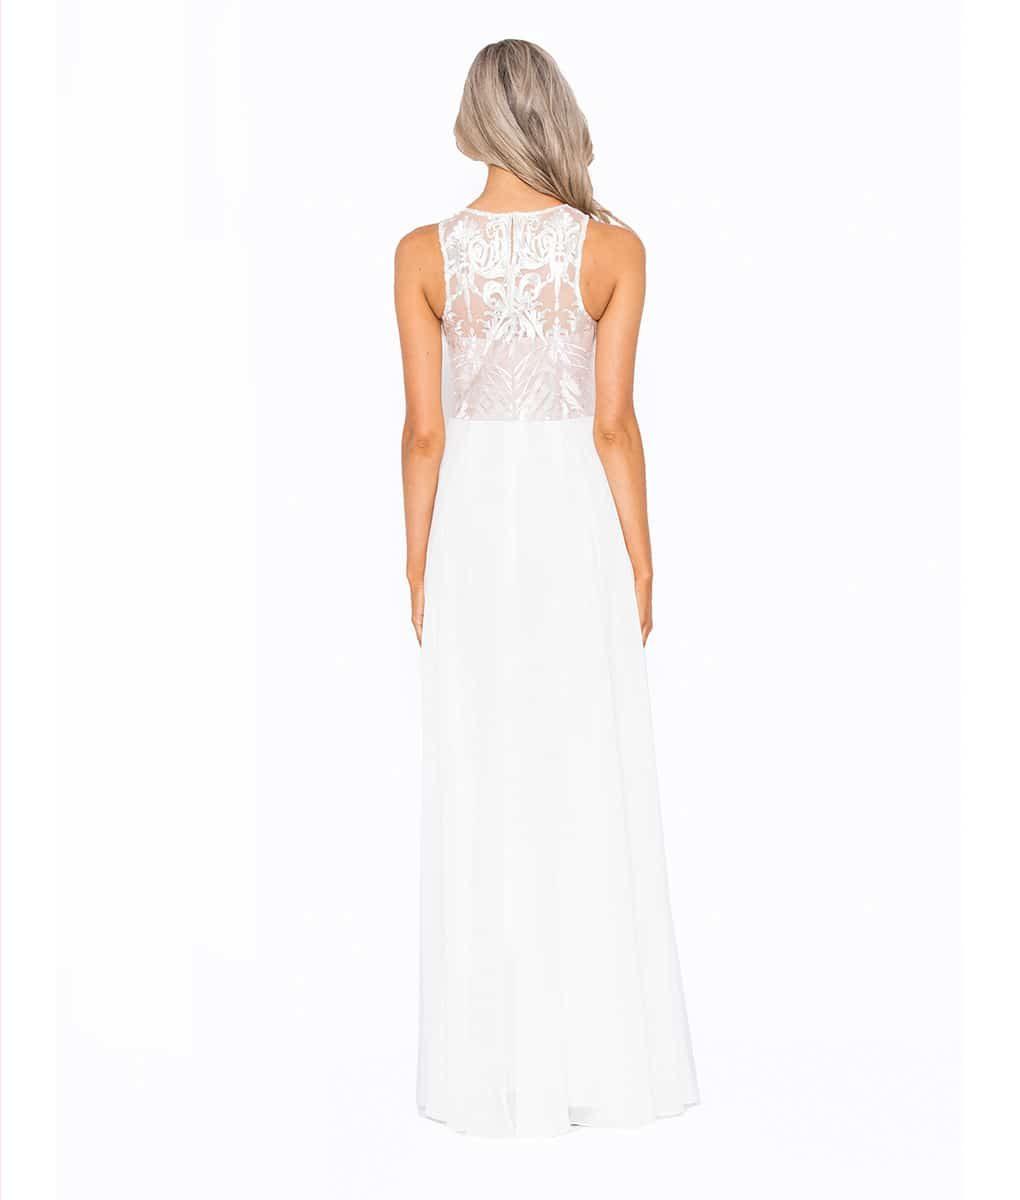 Alila Boutique White Lace Gown